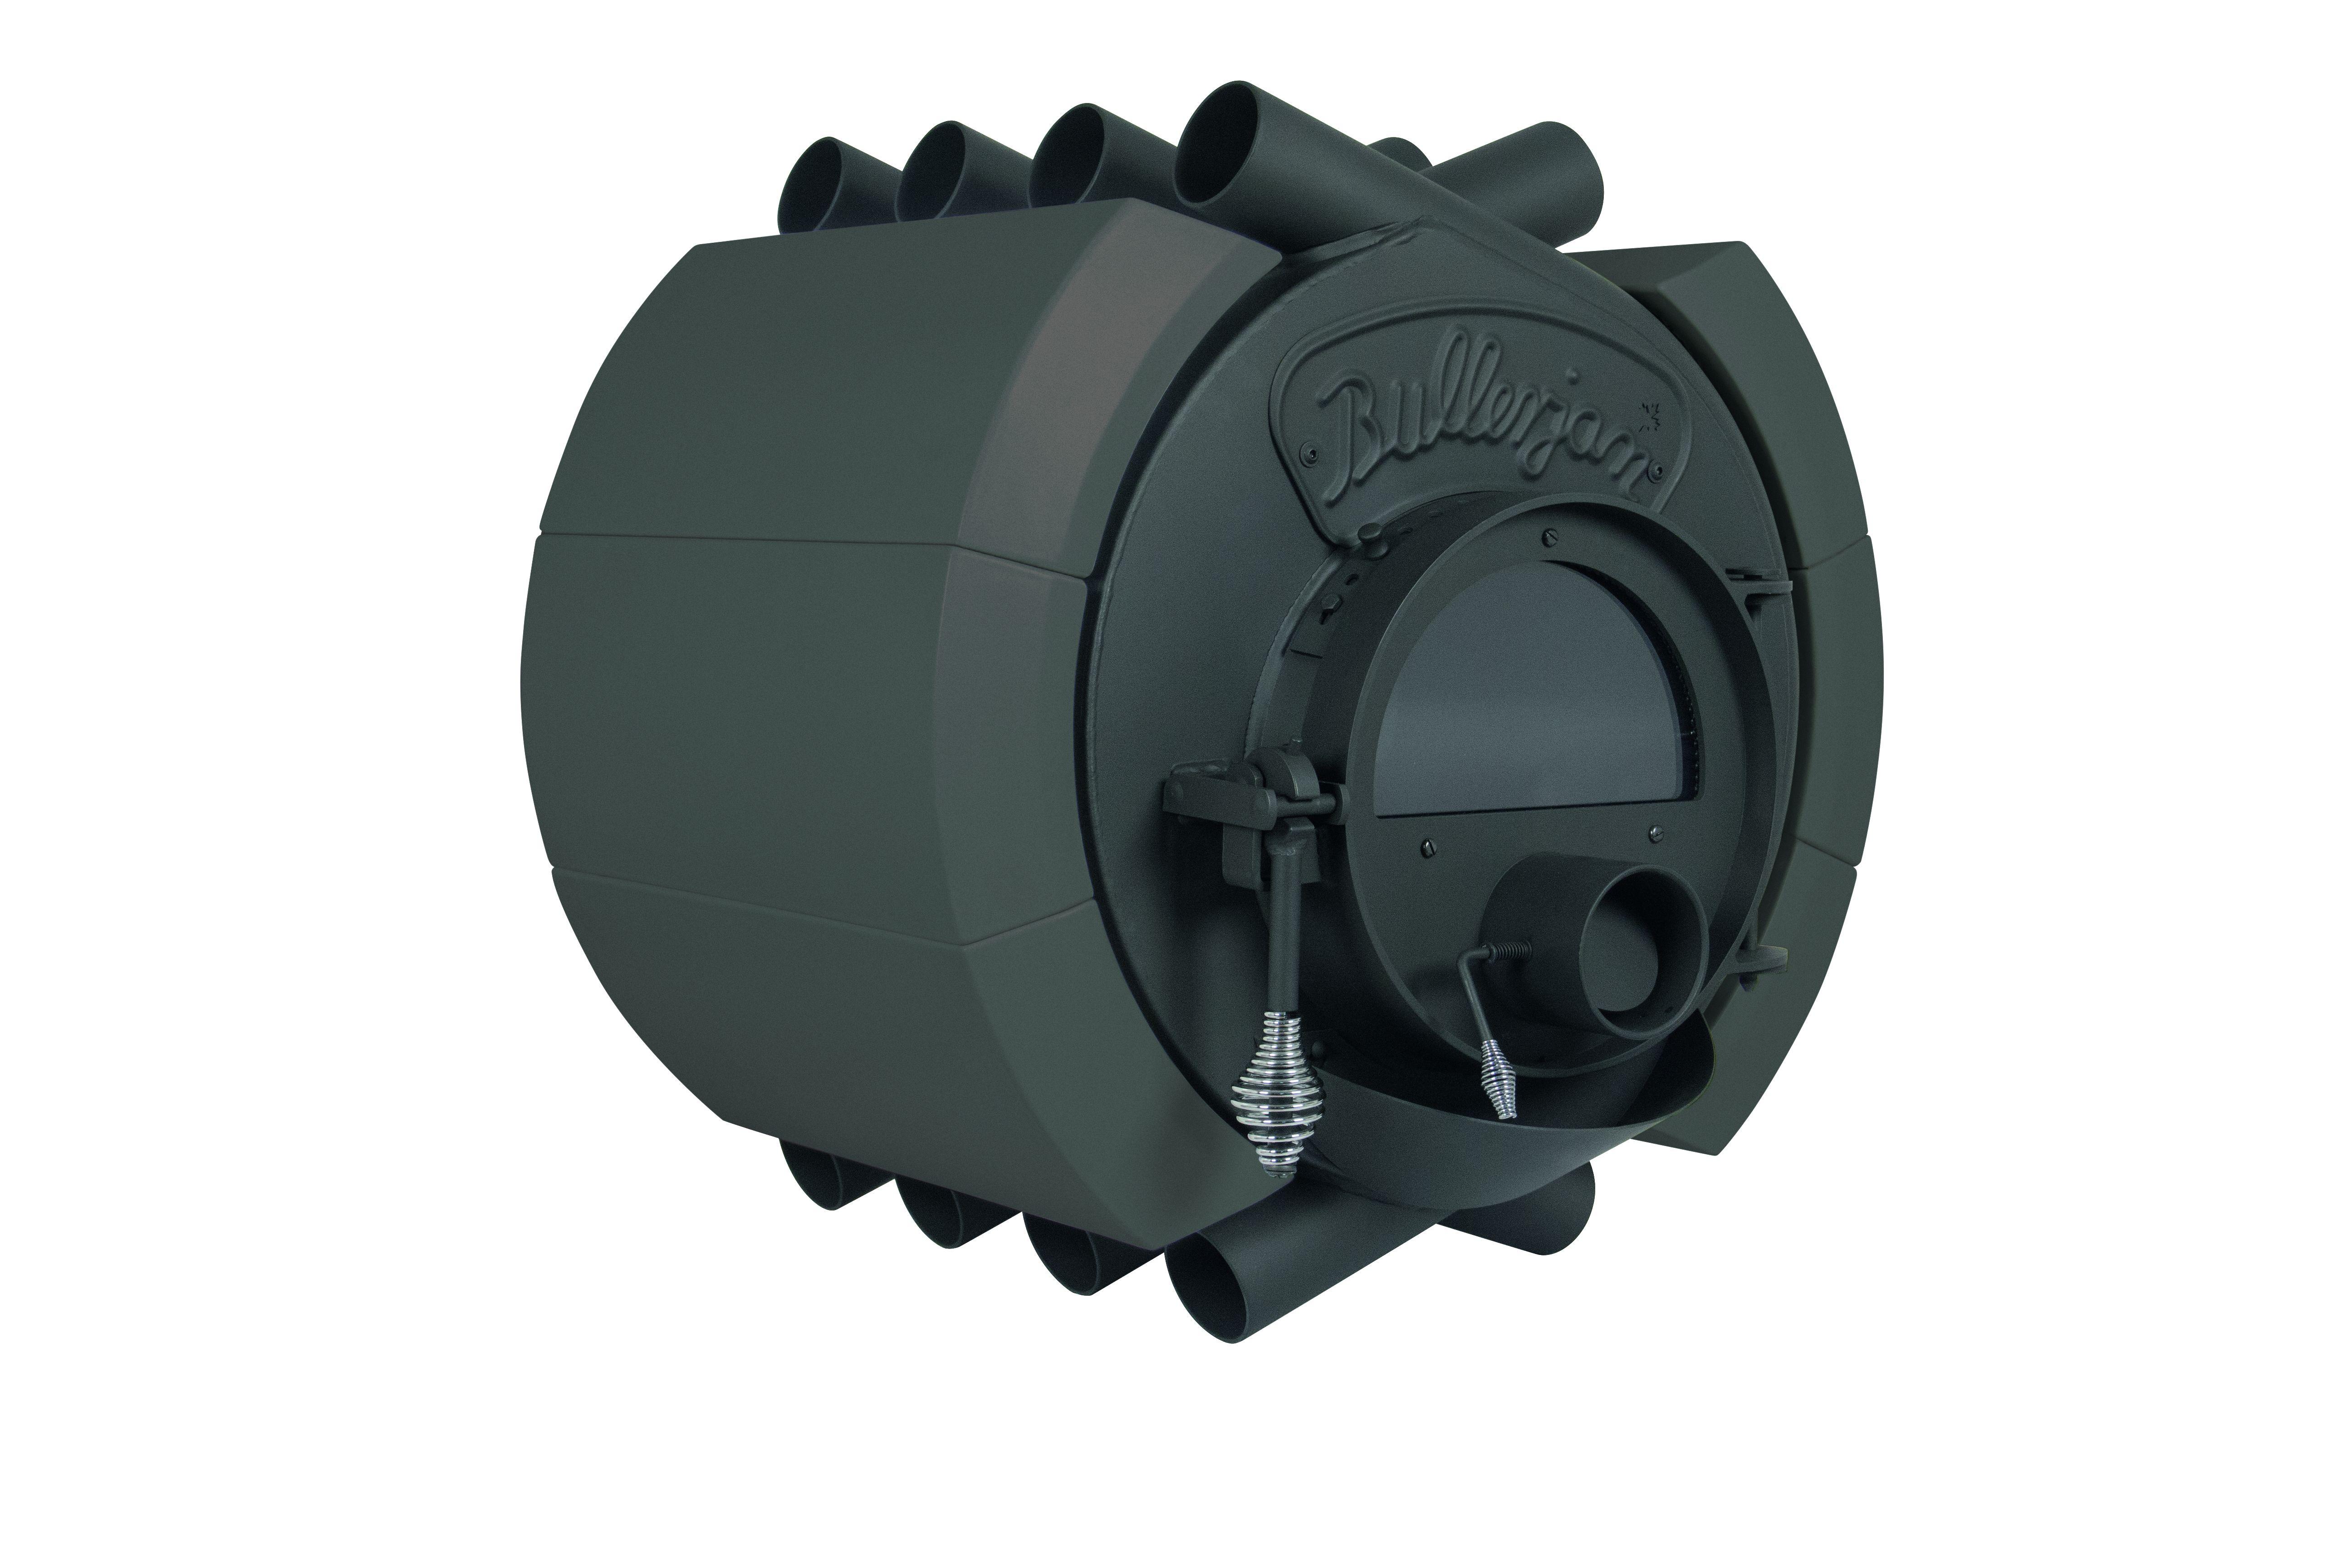 kaminofen free flow typ01 keramik schwarz von bullerjan. Black Bedroom Furniture Sets. Home Design Ideas